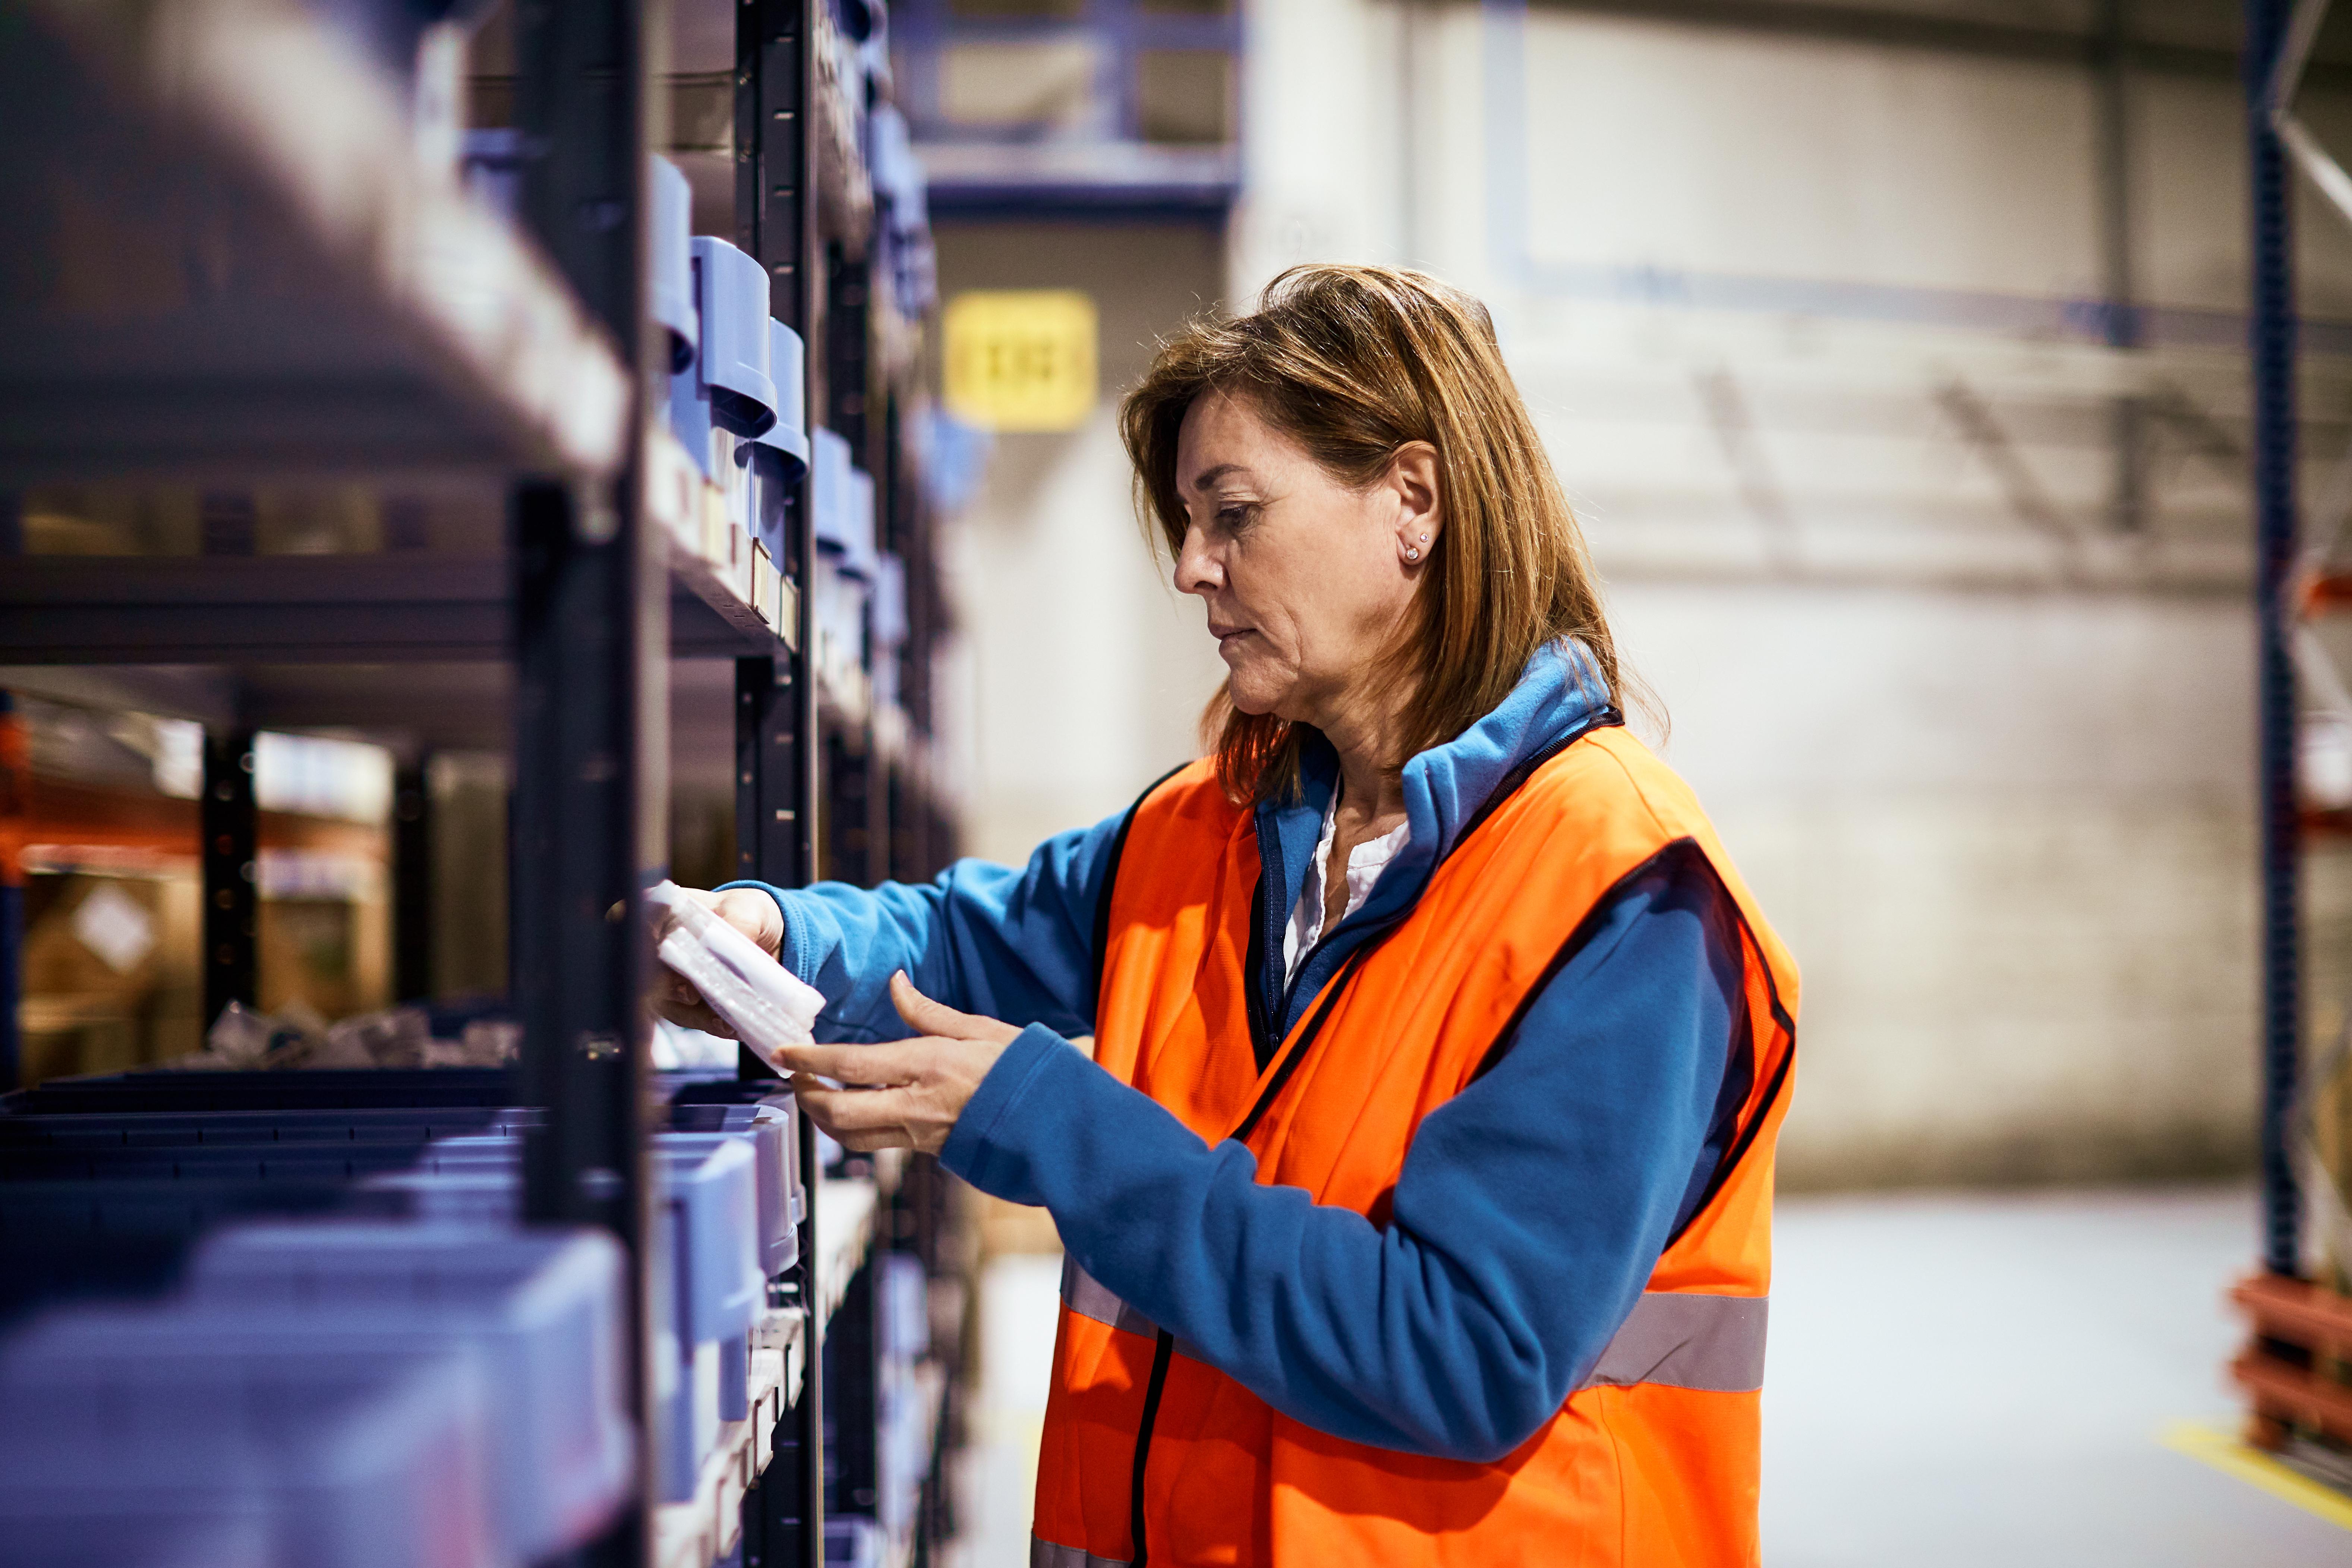 Warhouse employee checking goods